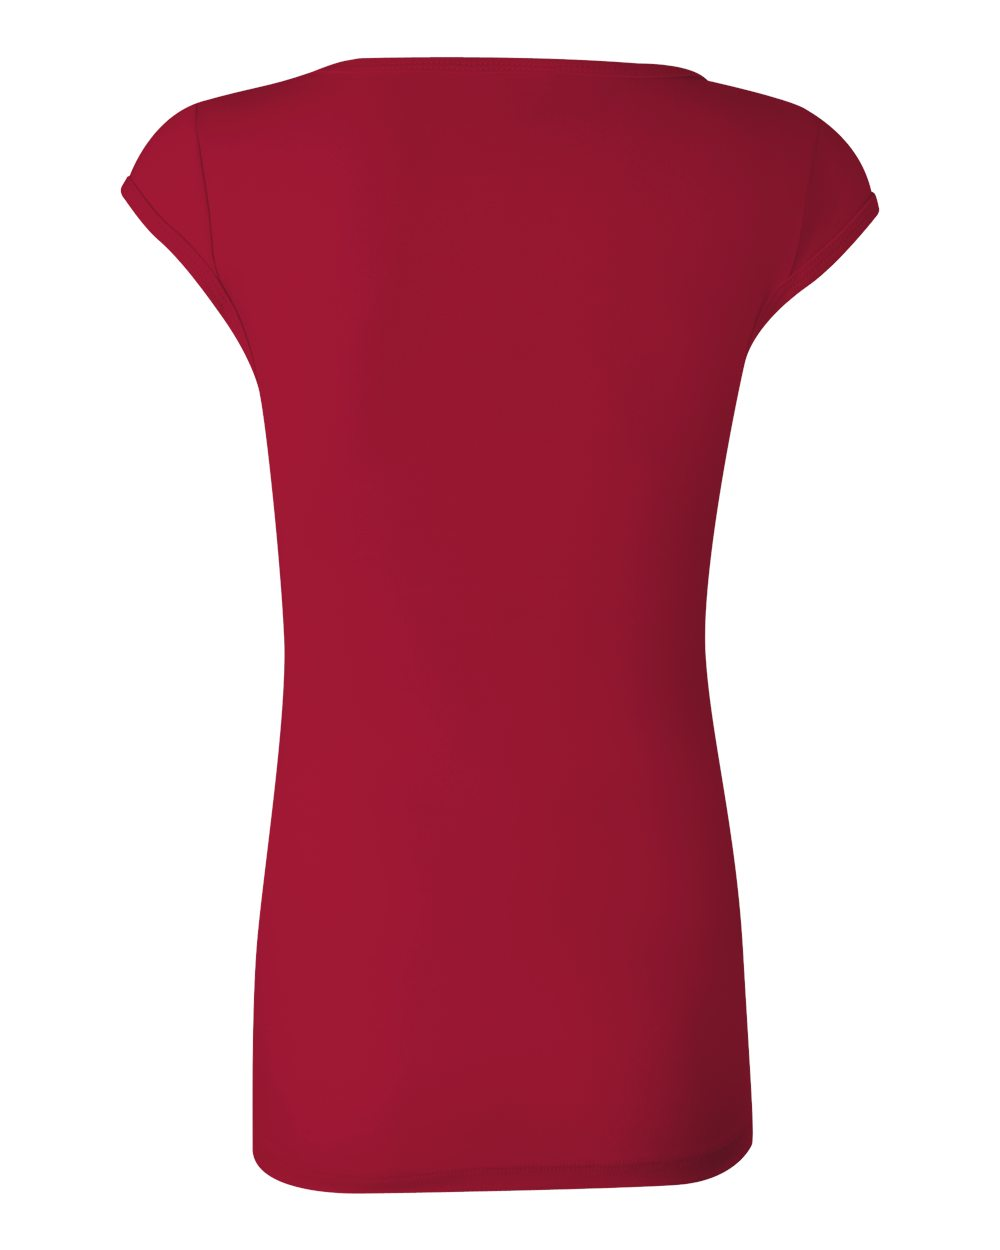 Bella-Canvas-Women-039-s-Sheer-Mini-Rib-Cap-Sleeve-Deep-V-Neck-T-Shirt-B8705-S-2XL thumbnail 10